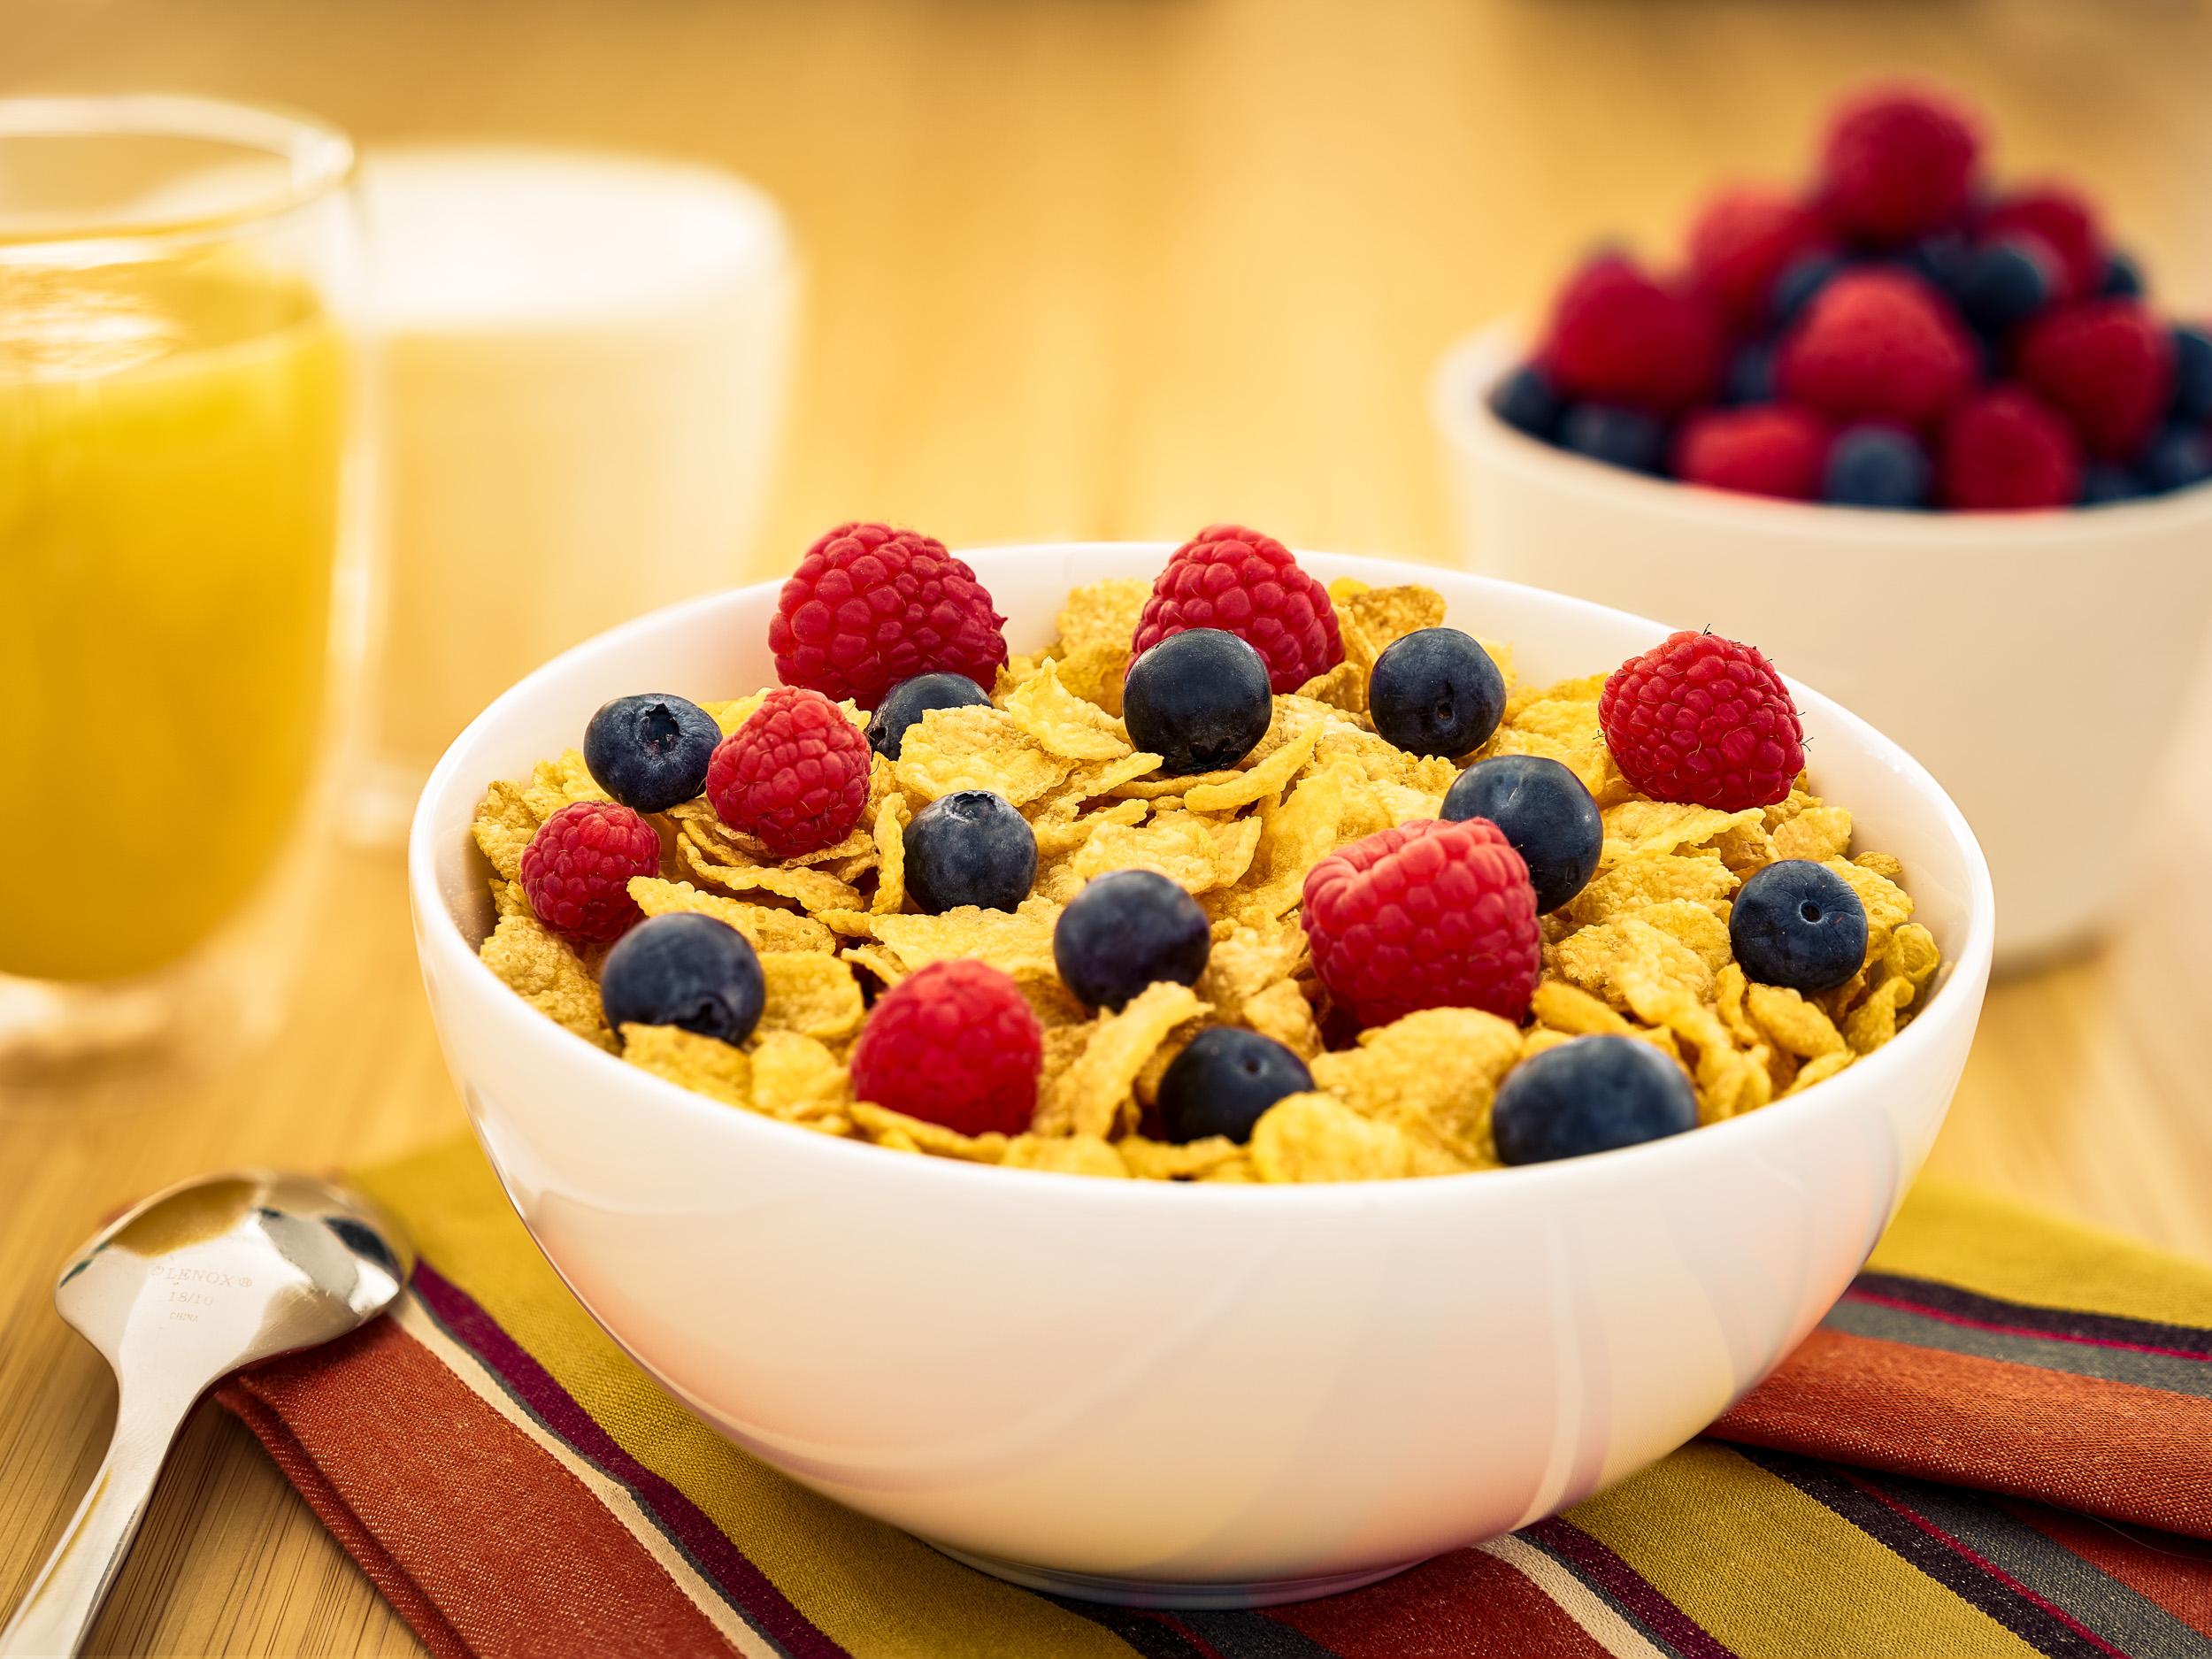 Miami_Fort_Lauderdale_food_photographer_cereal_breakfast_Franklin_Castillo-Edit.jpg